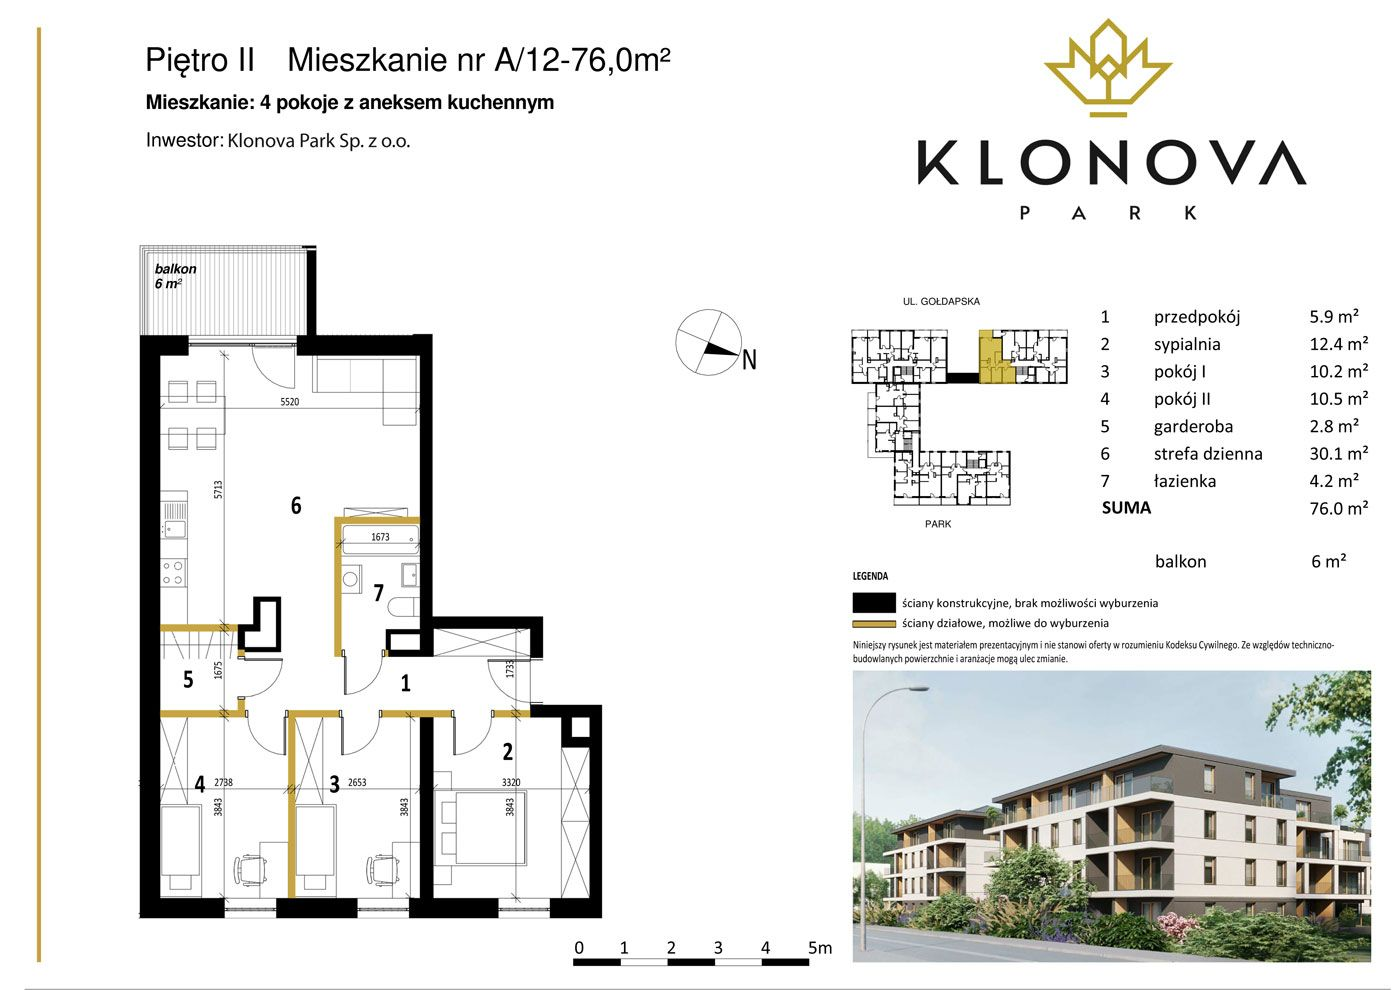 Apartamenty Klonova Park - Plan mieszkania A/12